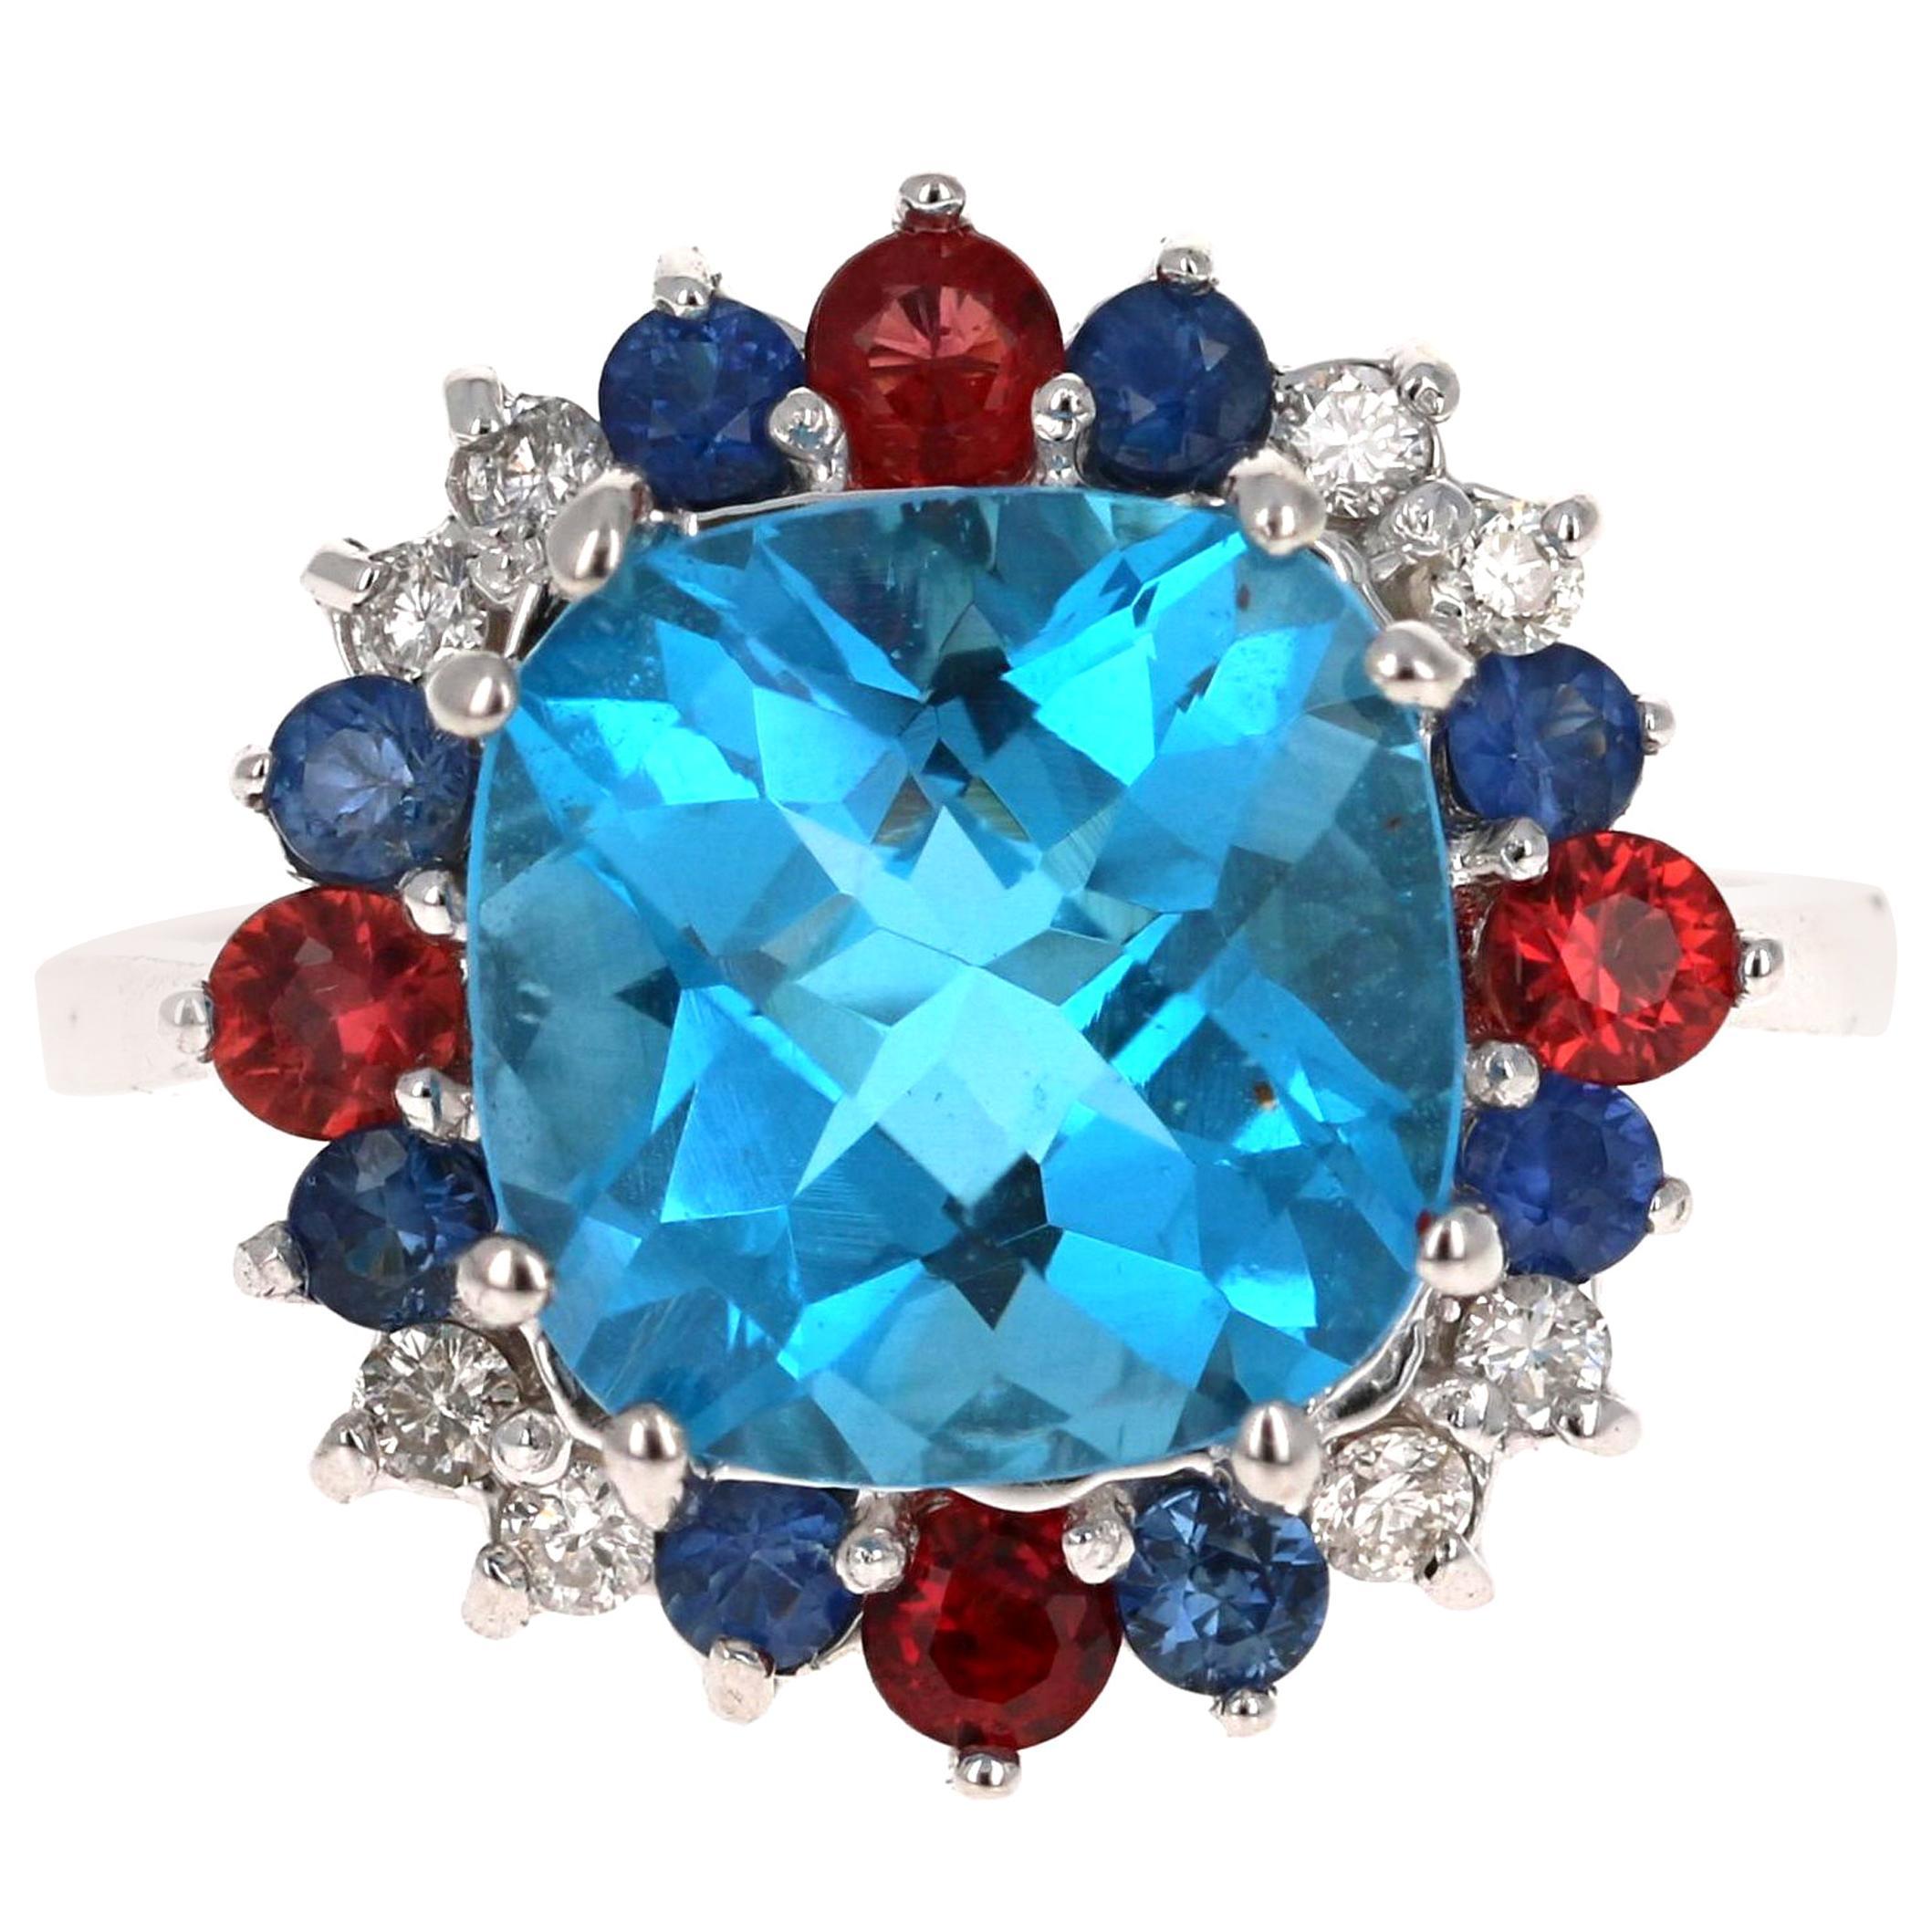 5.39 Carat Cushion Cut Blue Topaz Sapphire Diamond 14K White Gold Cocktail Ring